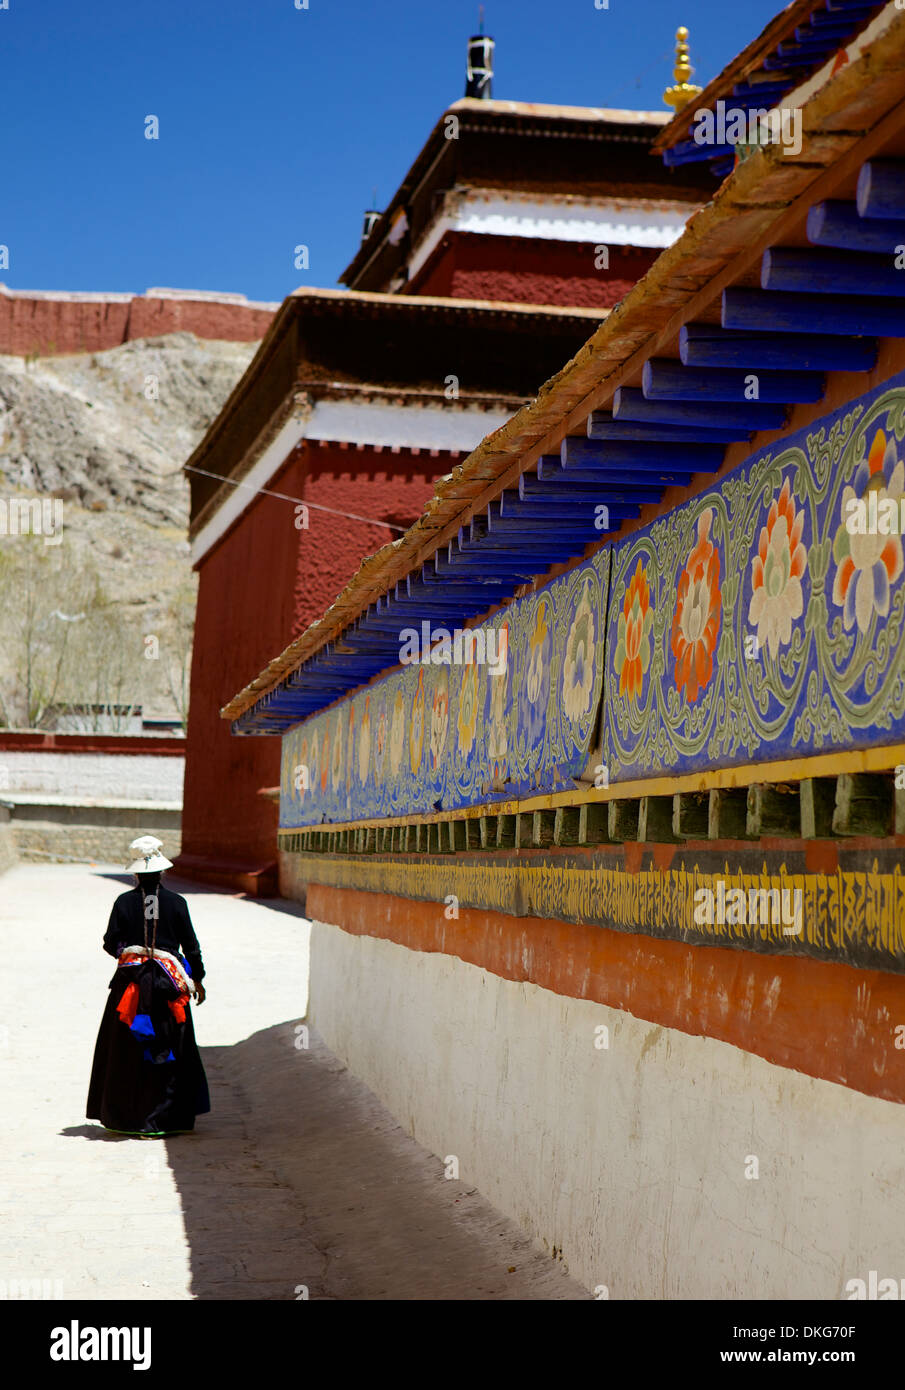 Tibetan Pilgrim circling the base of Kumbum chorten (Stupa) in the Palcho Monastery at Gyantse, Tibet, China, Asia - Stock Image